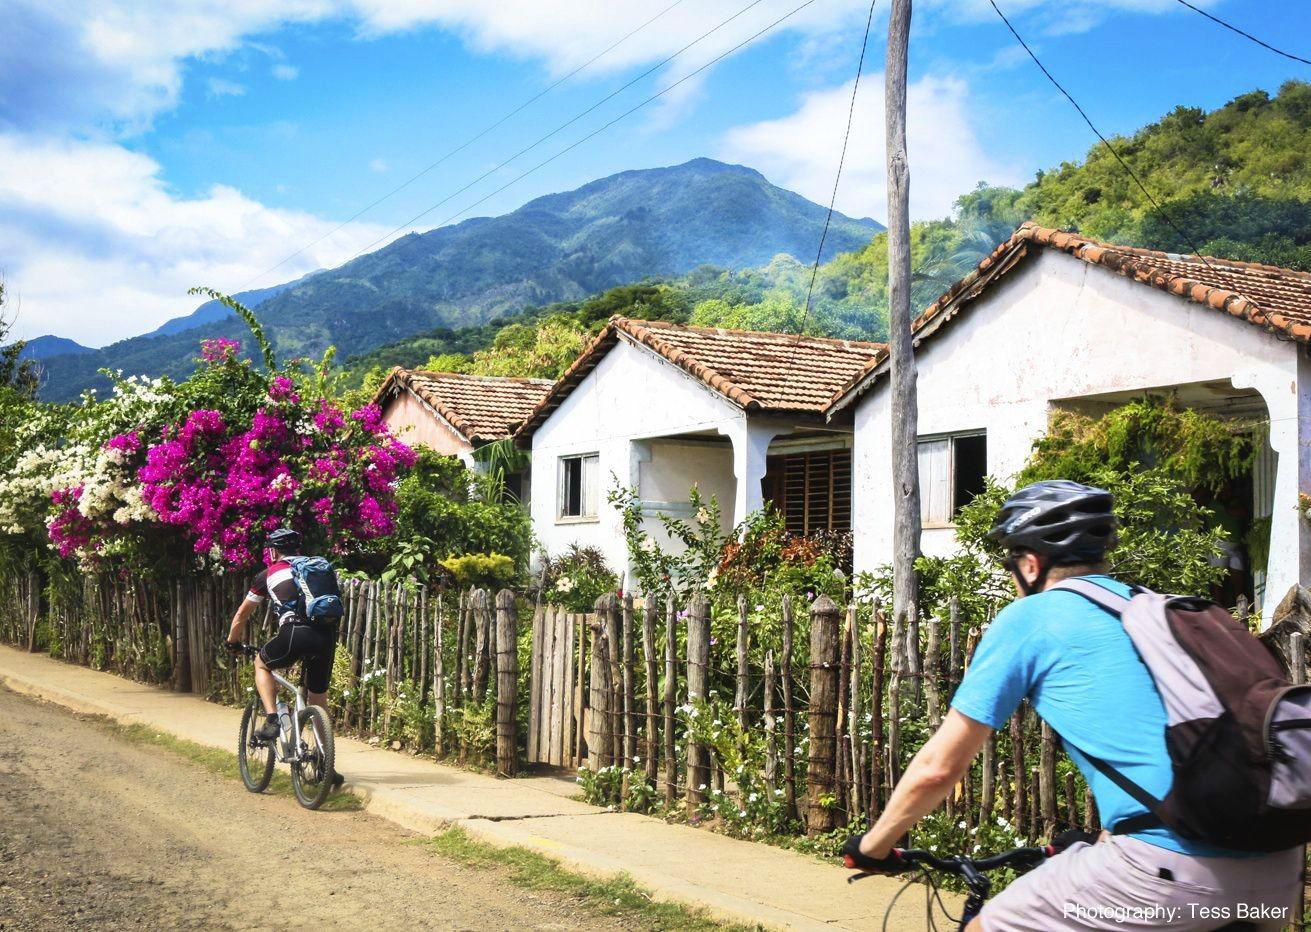 _Holiday.1.12464.jpg - Cuba - Cuban Revolutions - Cycling Adventures